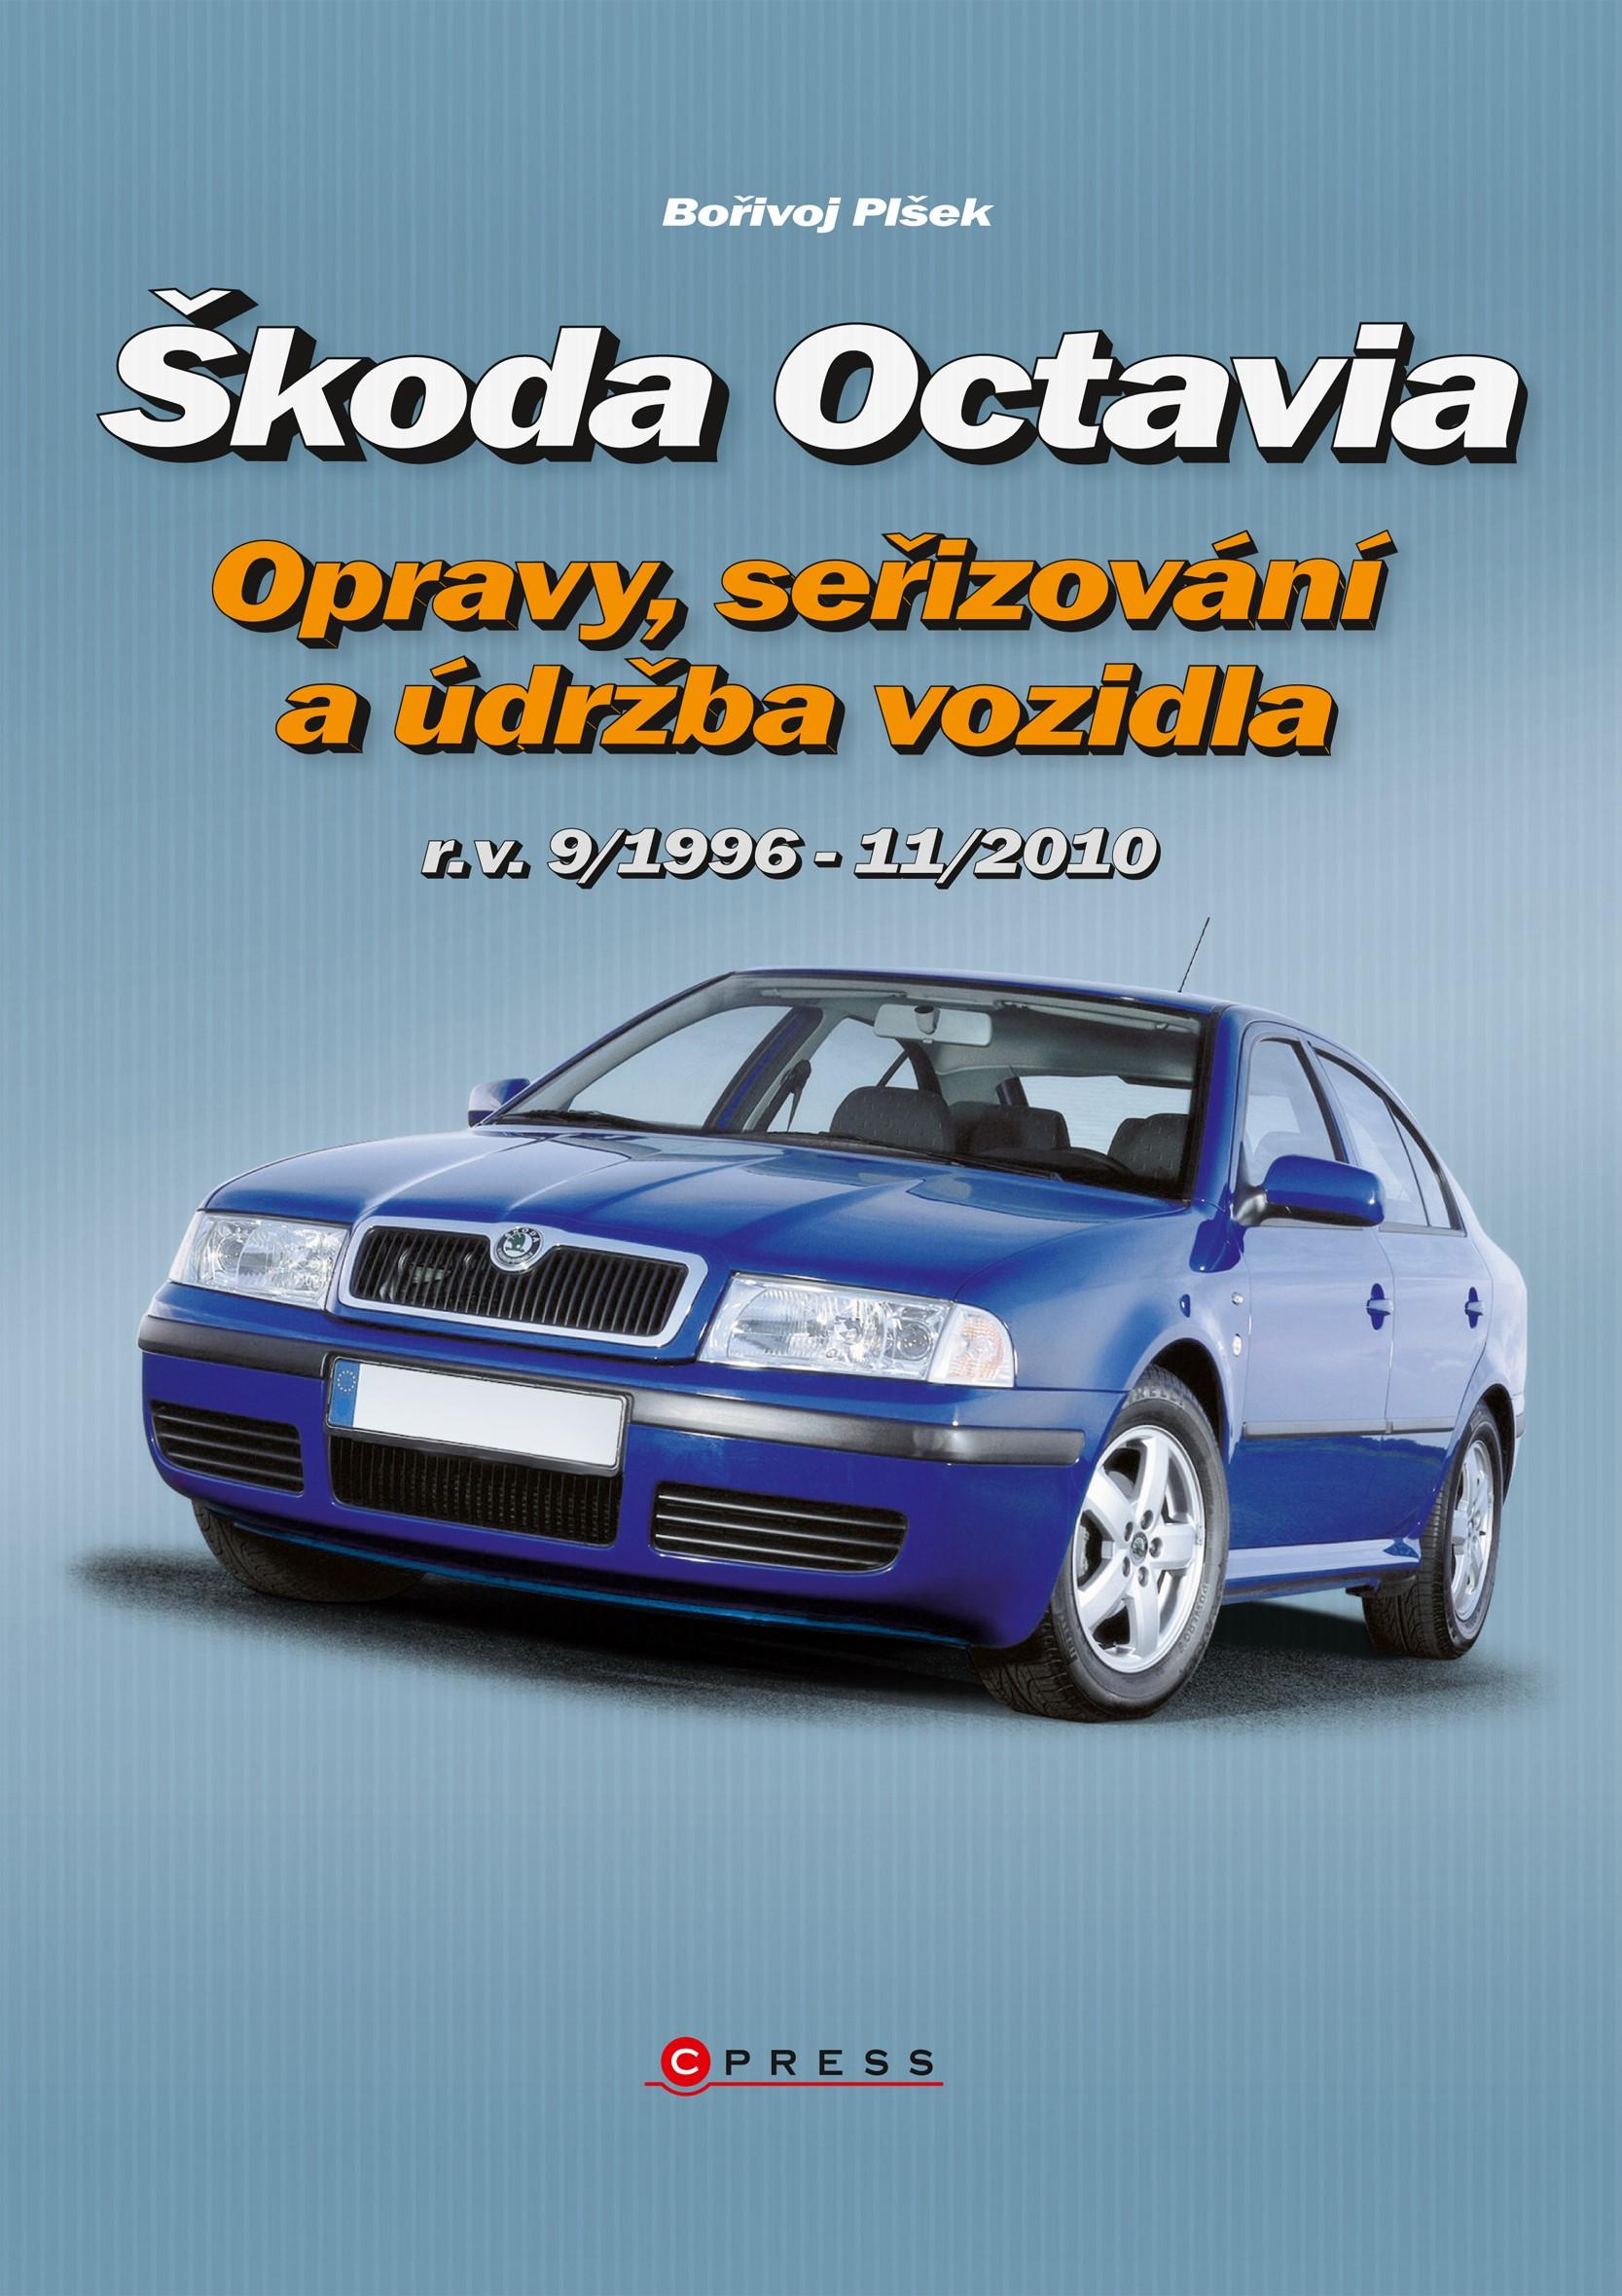 Škoda Octavia | Bořivoj Plšek